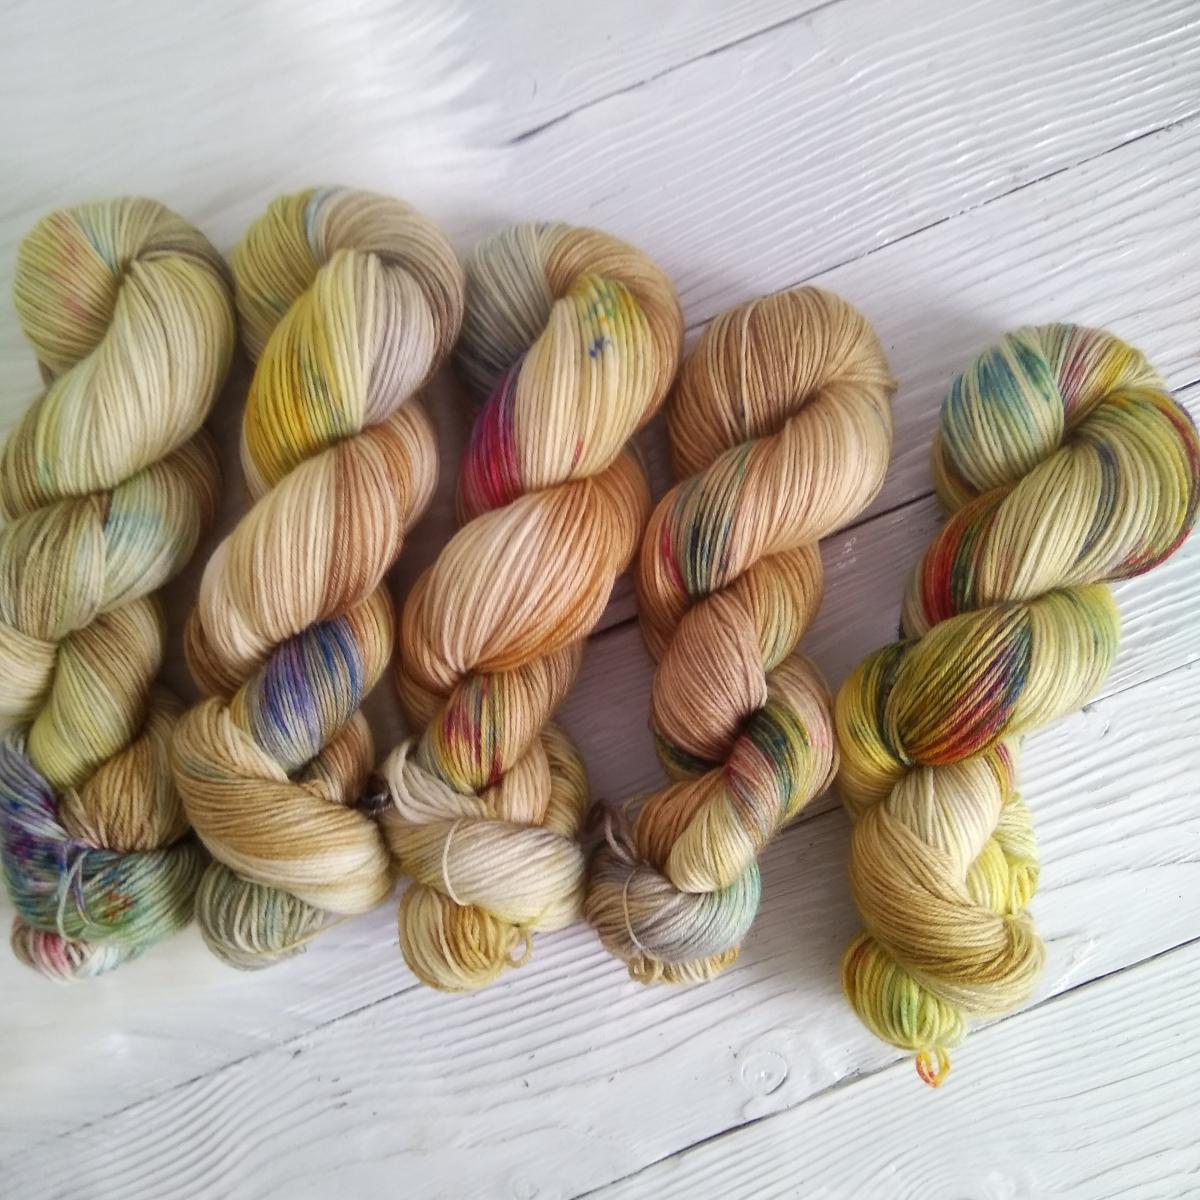 woodico.pro hand dyed yarn 032 7 1200x1200 - Hand dyed yarn / 032